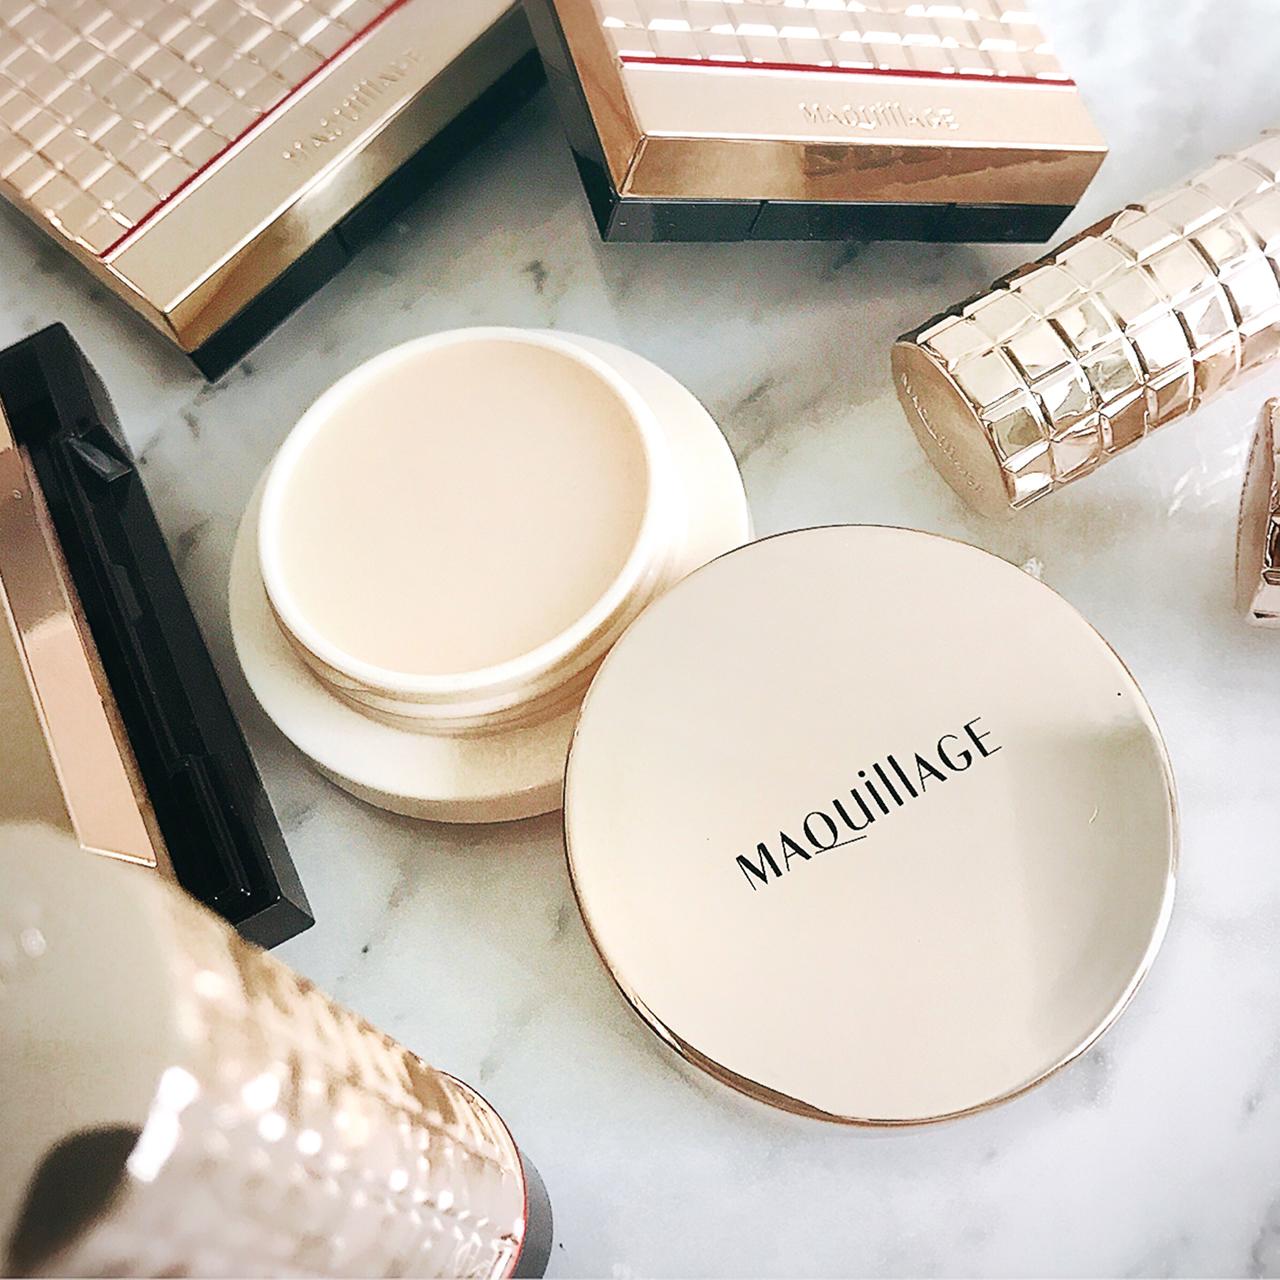 Shiseido Maquillage Flat Change Base